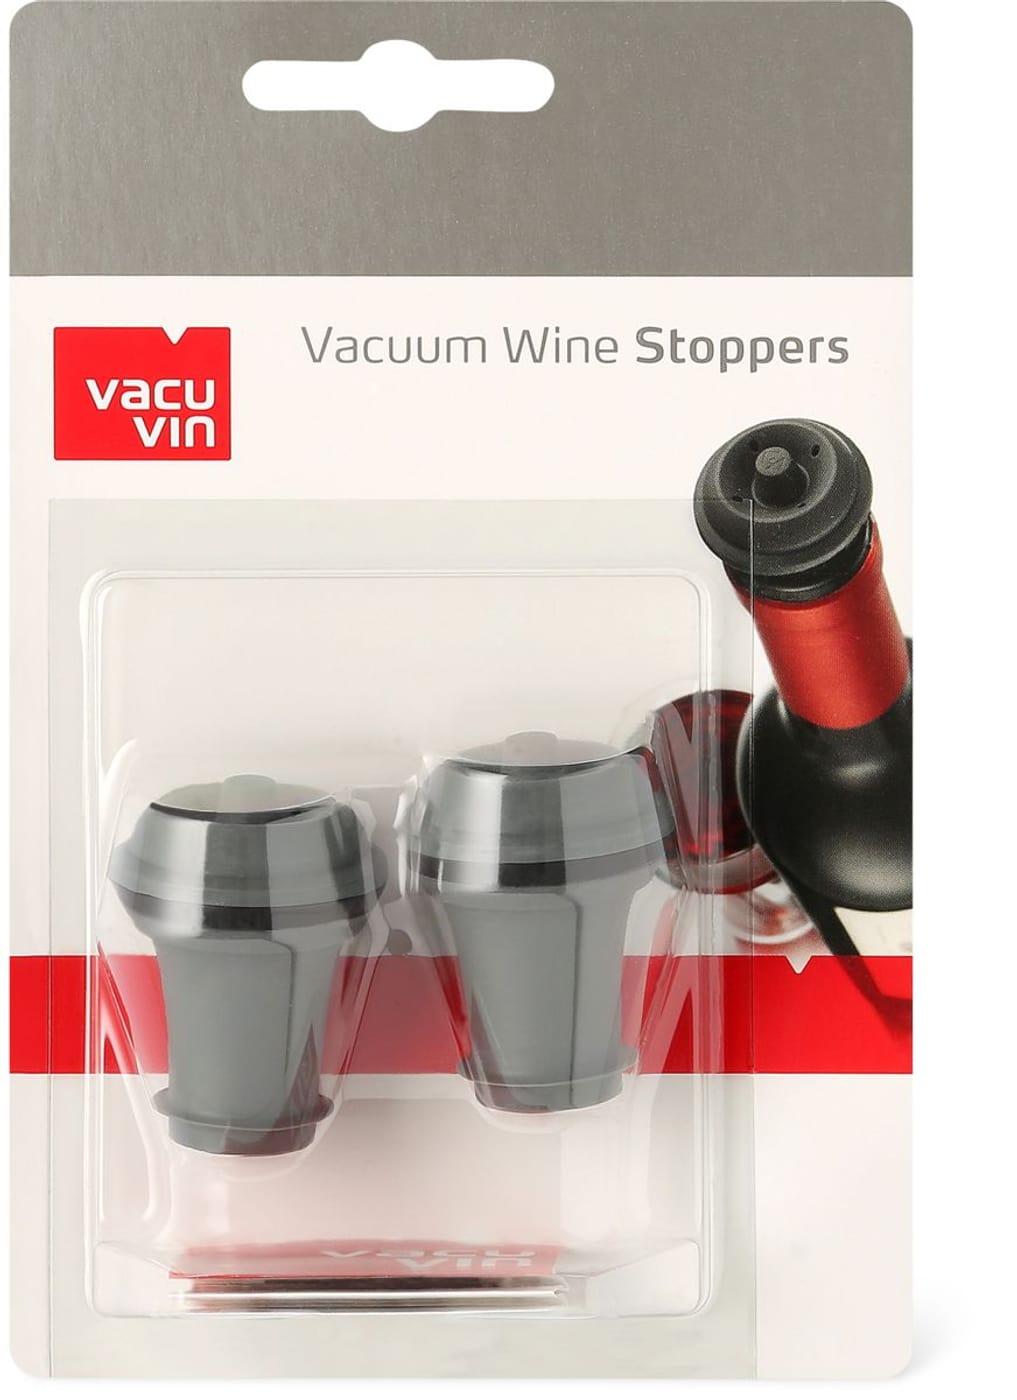 Vacuvin vakuumweinstopfen cucina tavola migros for Tavola cucina